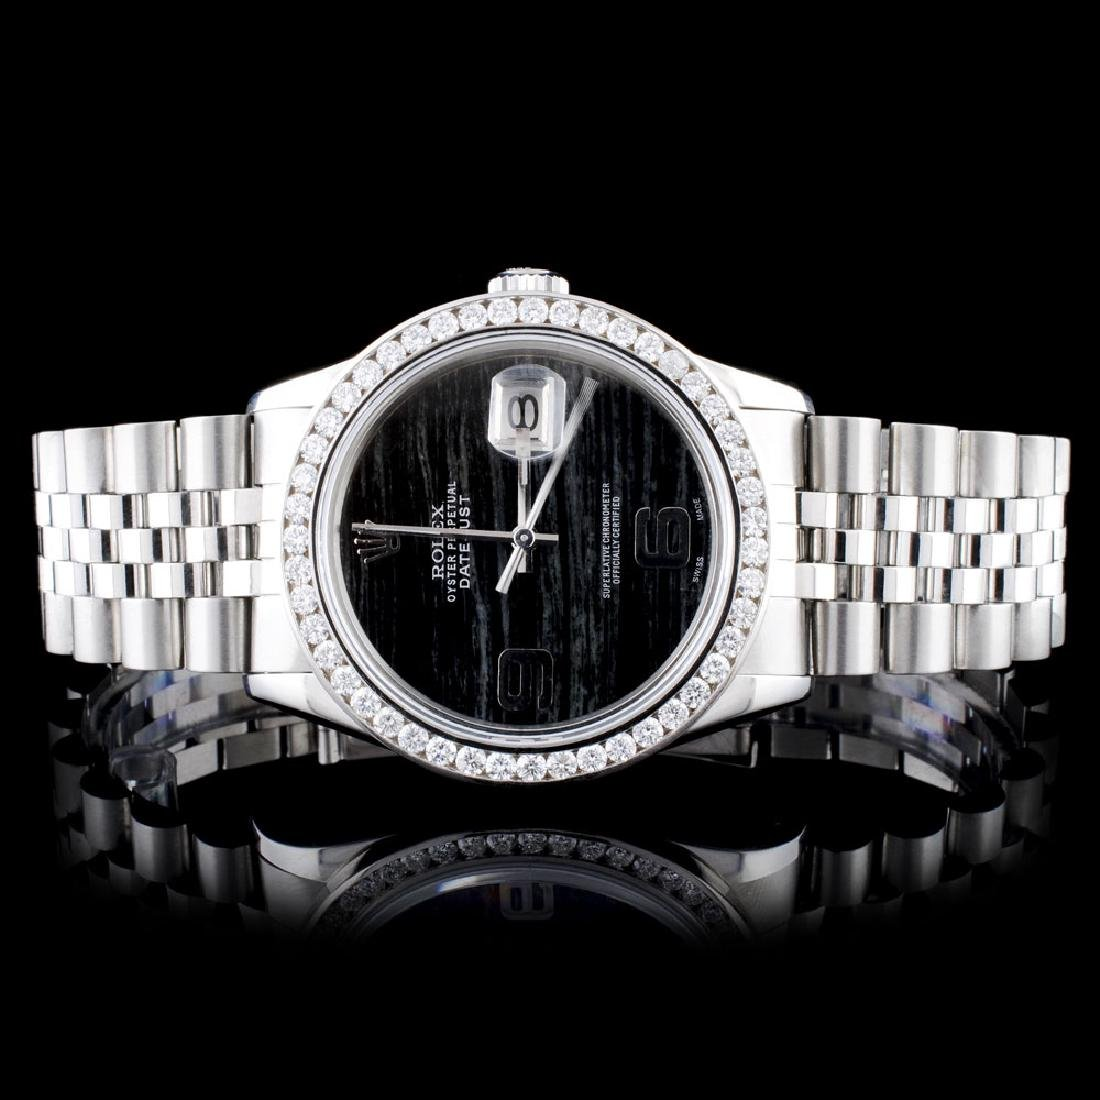 Rolex SS DateJust 1.50ct Diamond 36MM Wristwatch